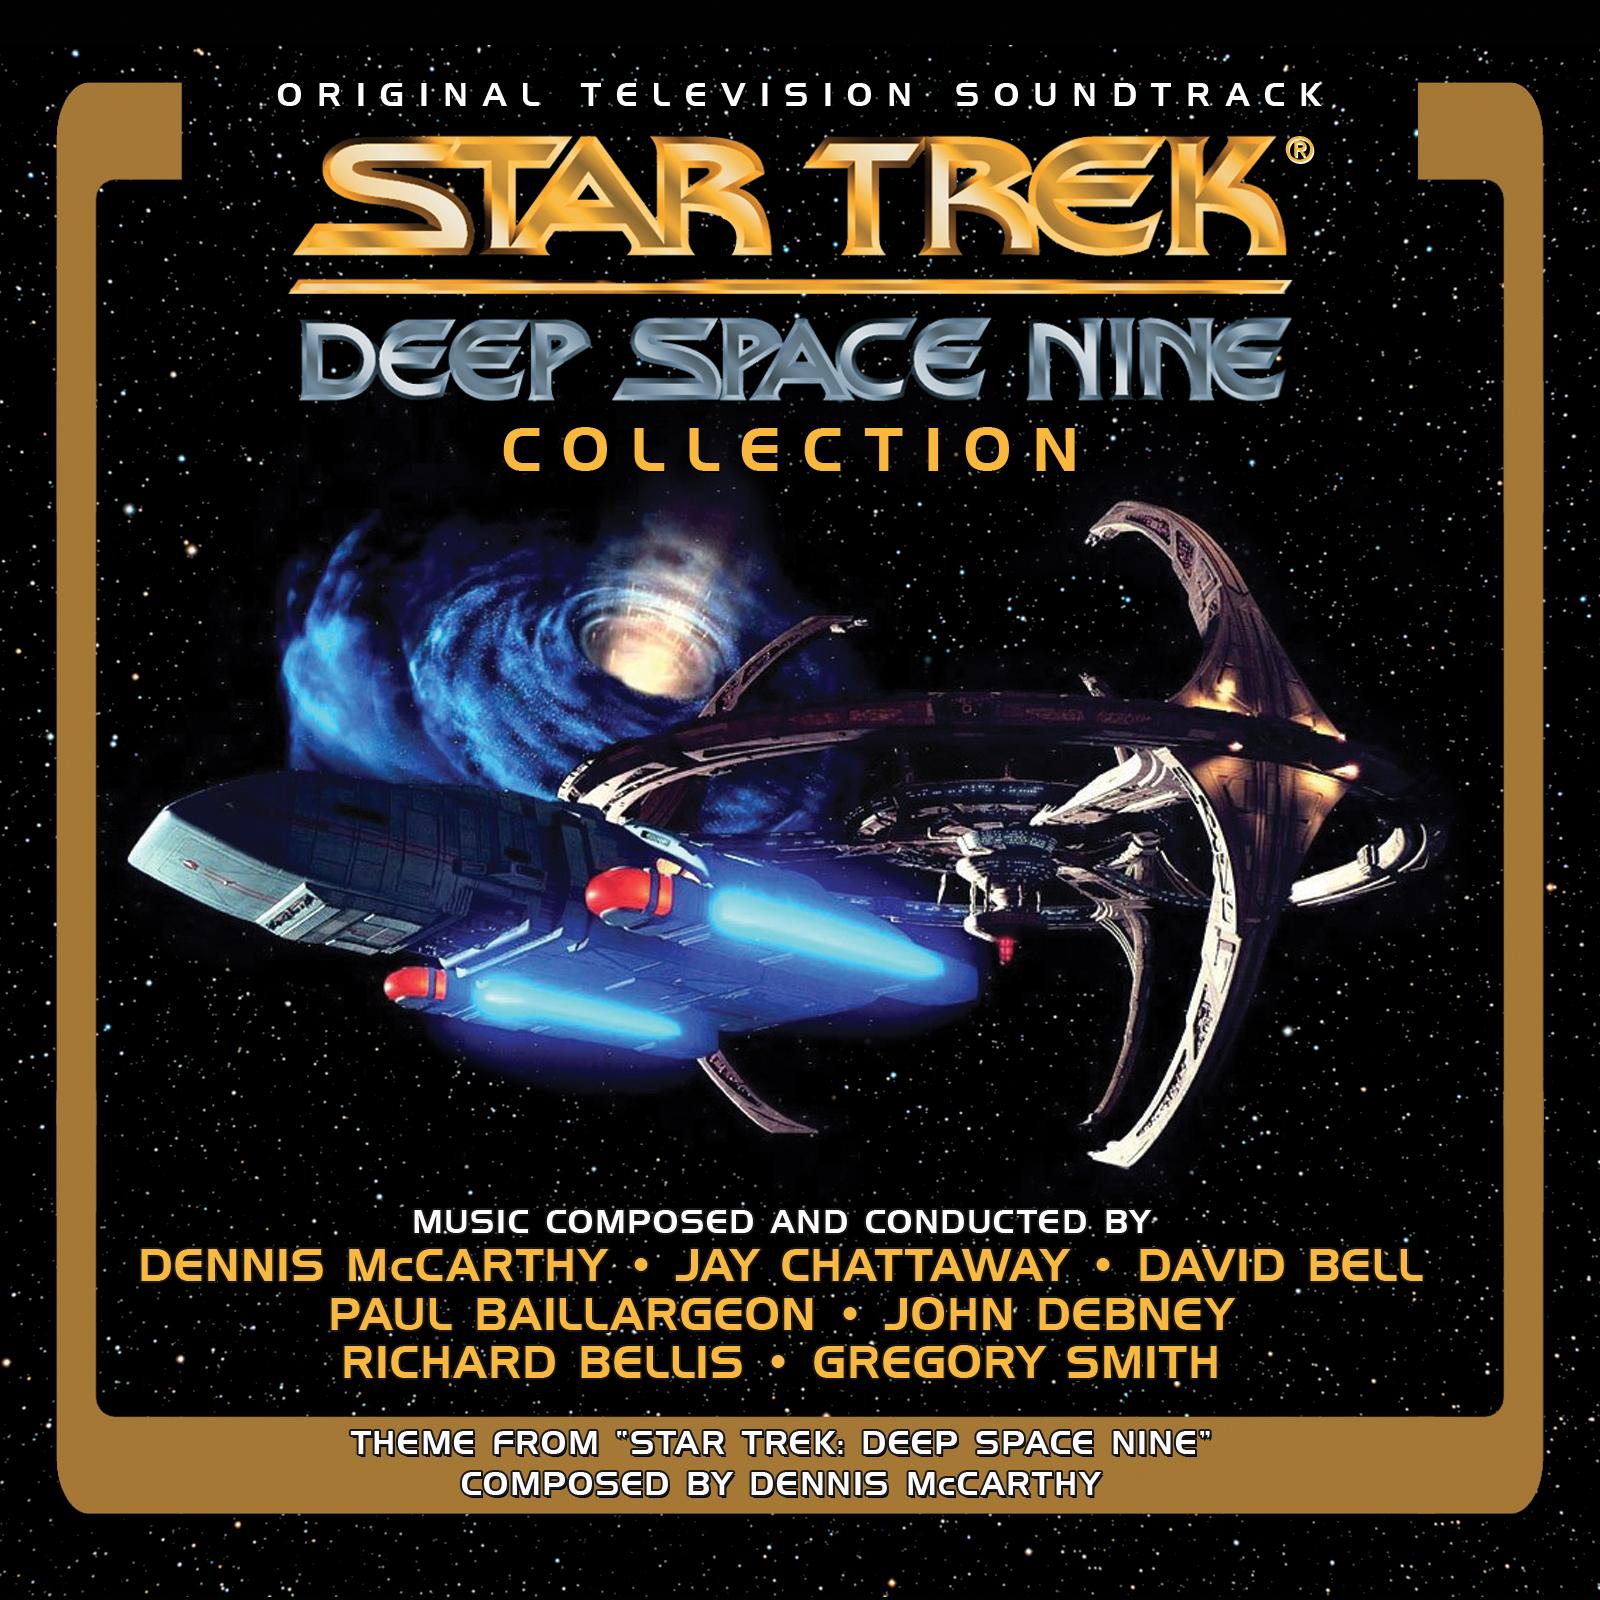 Star Trek: Deep Space Nine Collection